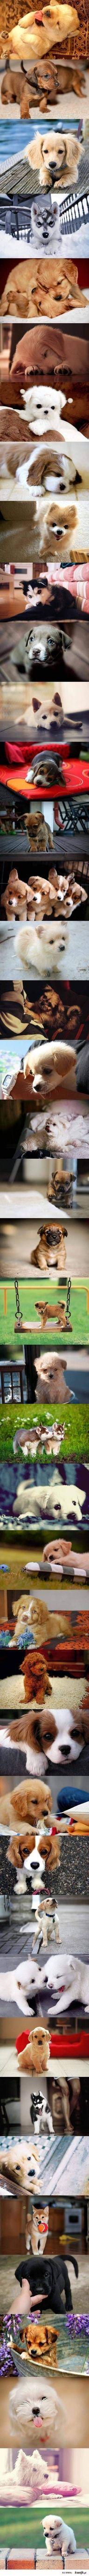 puppies, puppies!!: Doggie, Cute Overload, Adorable Puppys, Puppys Love, Cutest Puppys, My Heart, Bad Day, Puppiesss, Cute Puppys